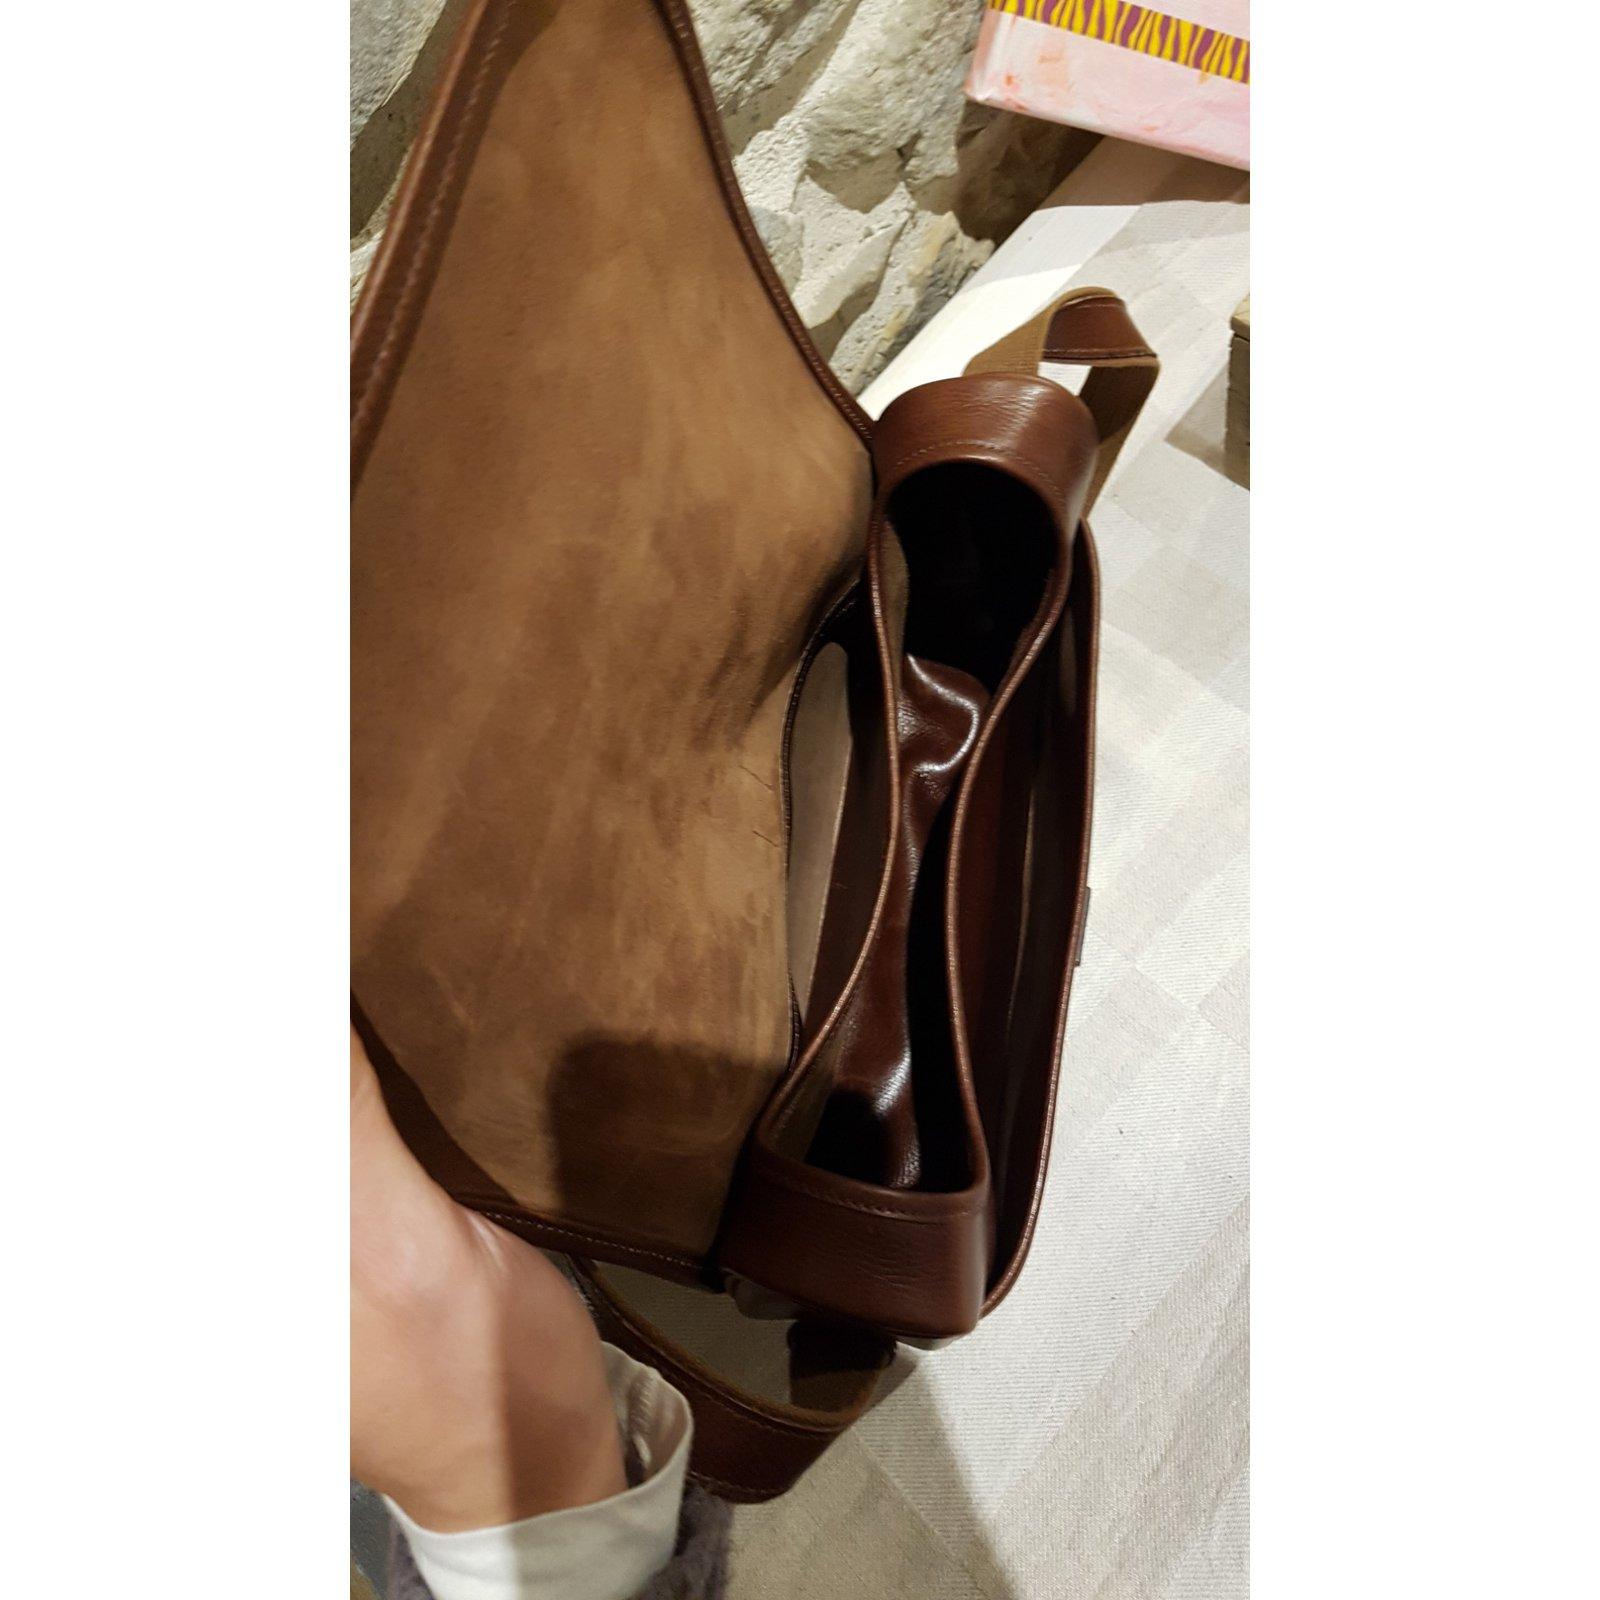 cd4d25997fc6 Hermès Nouméa leather bag courchevel chocolate Handbags Leather Brown  ref.94659 - Joli Closet